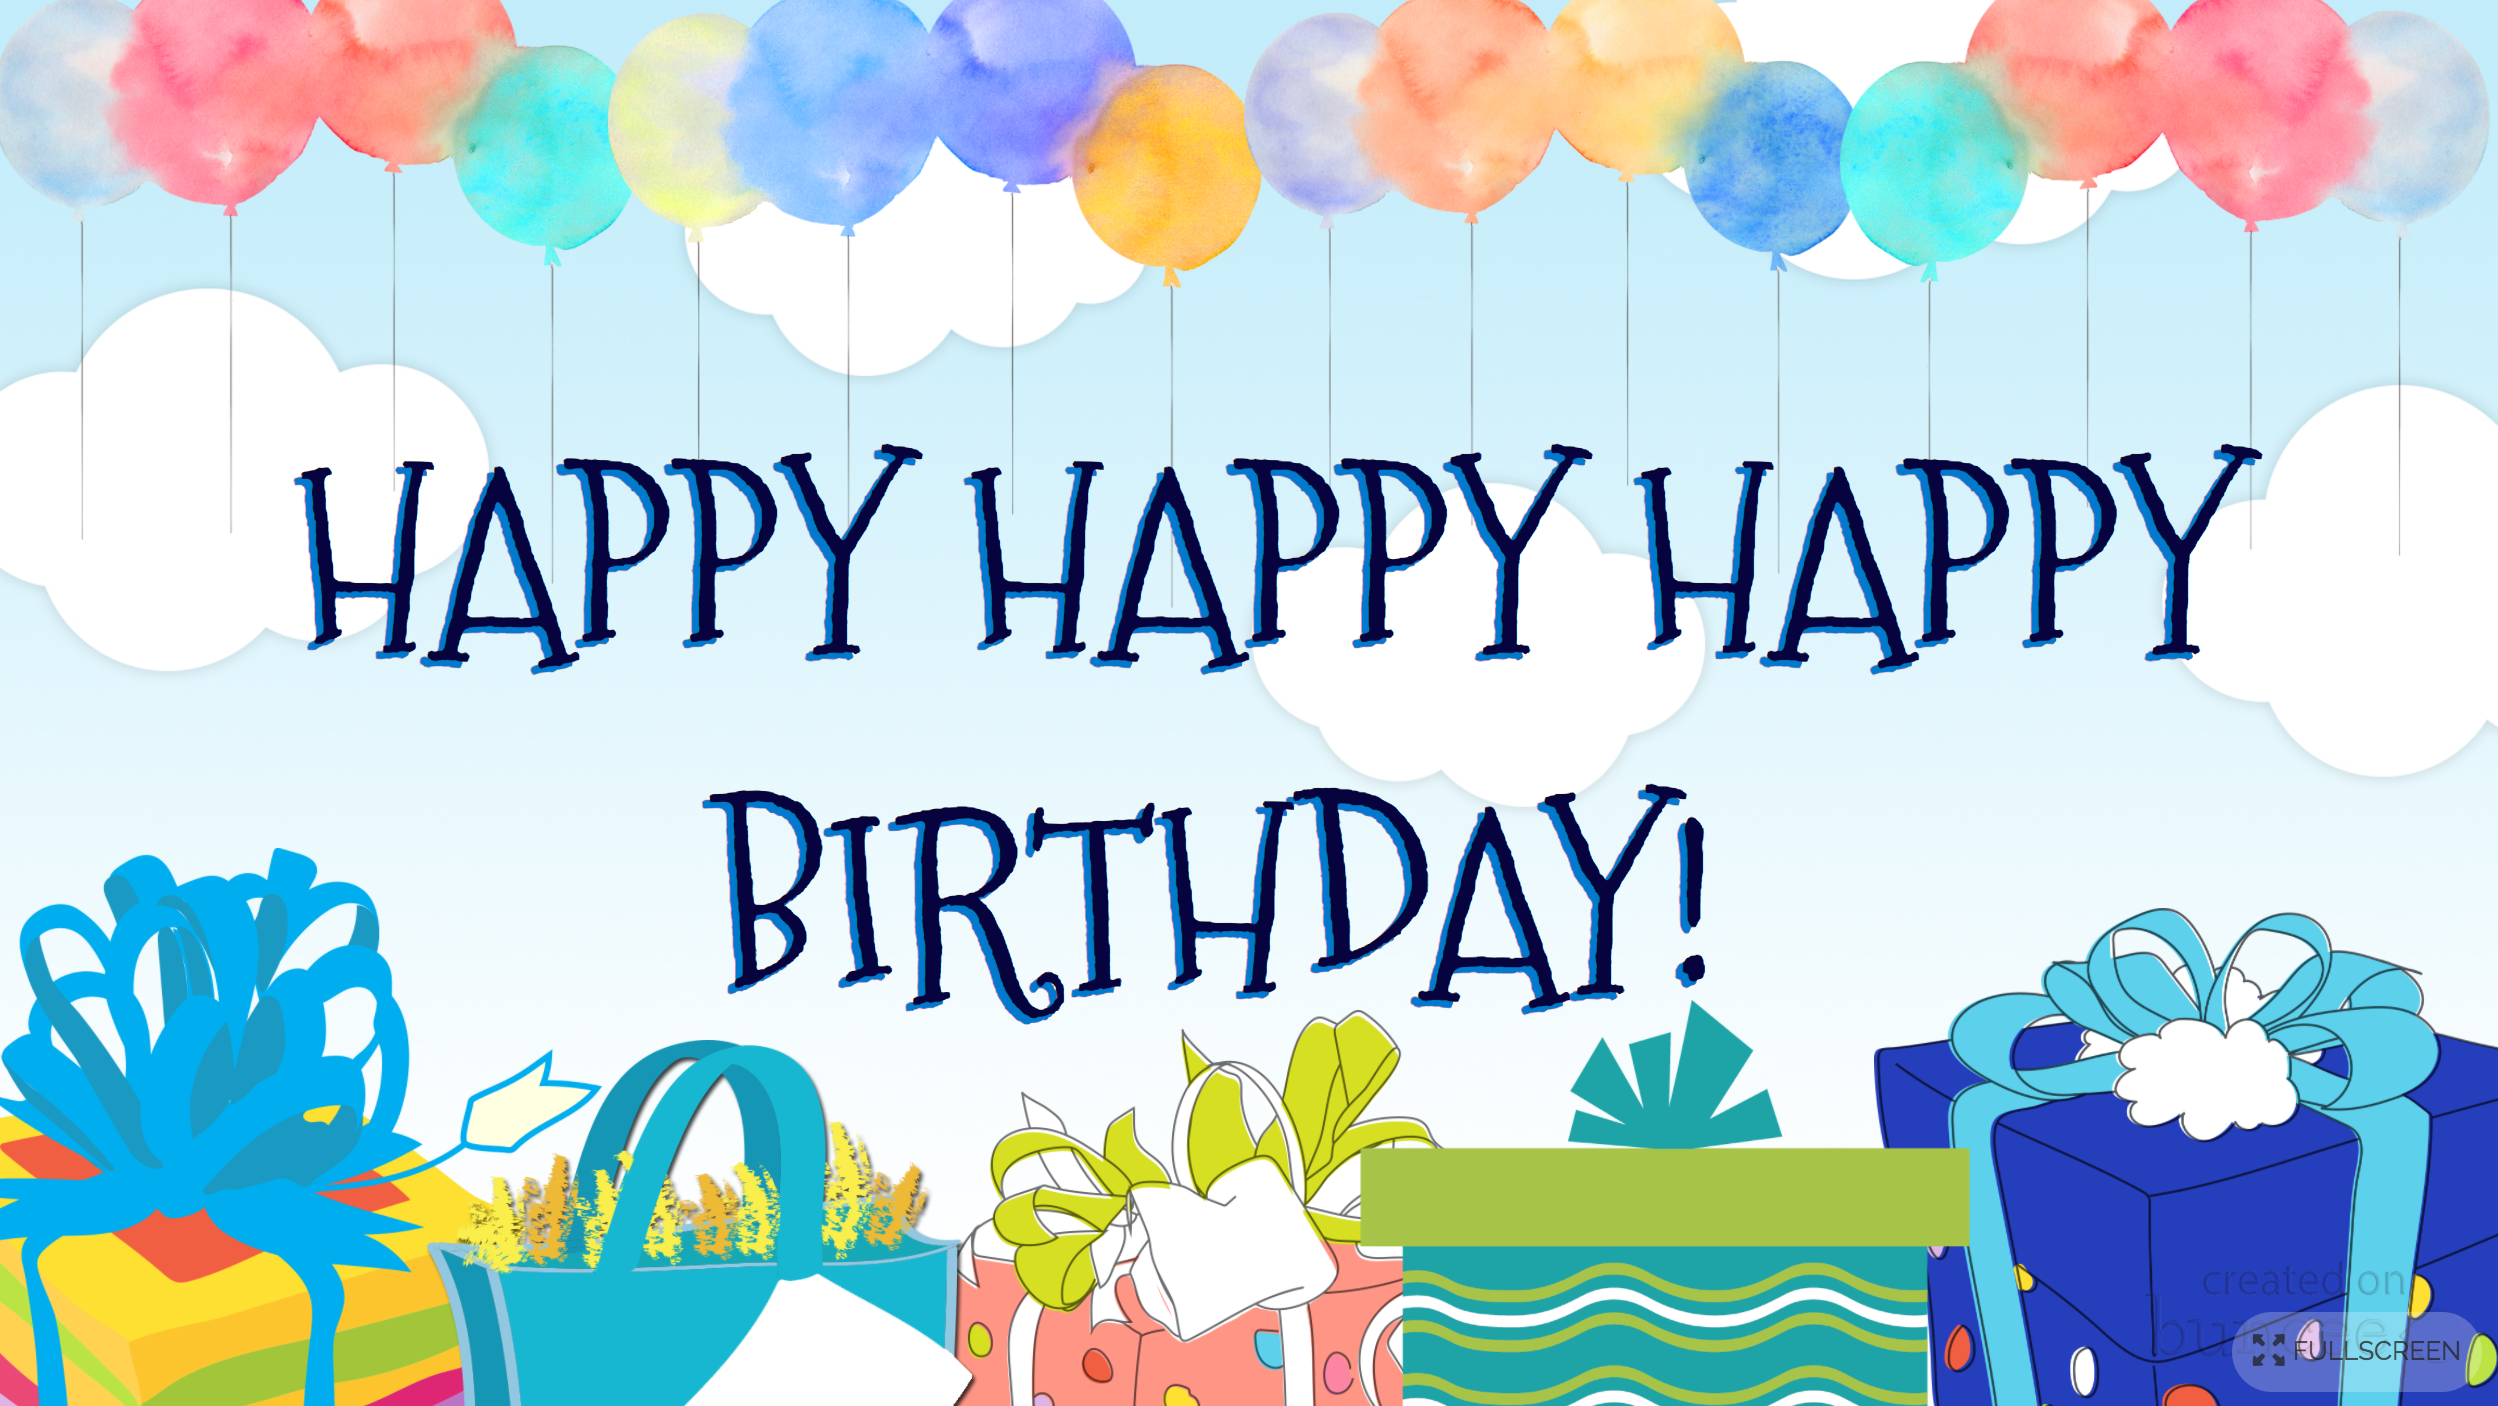 Incredible Buncee Happybirthday Birthday Cake Ts Presents Balloons Funny Birthday Cards Online Sheoxdamsfinfo